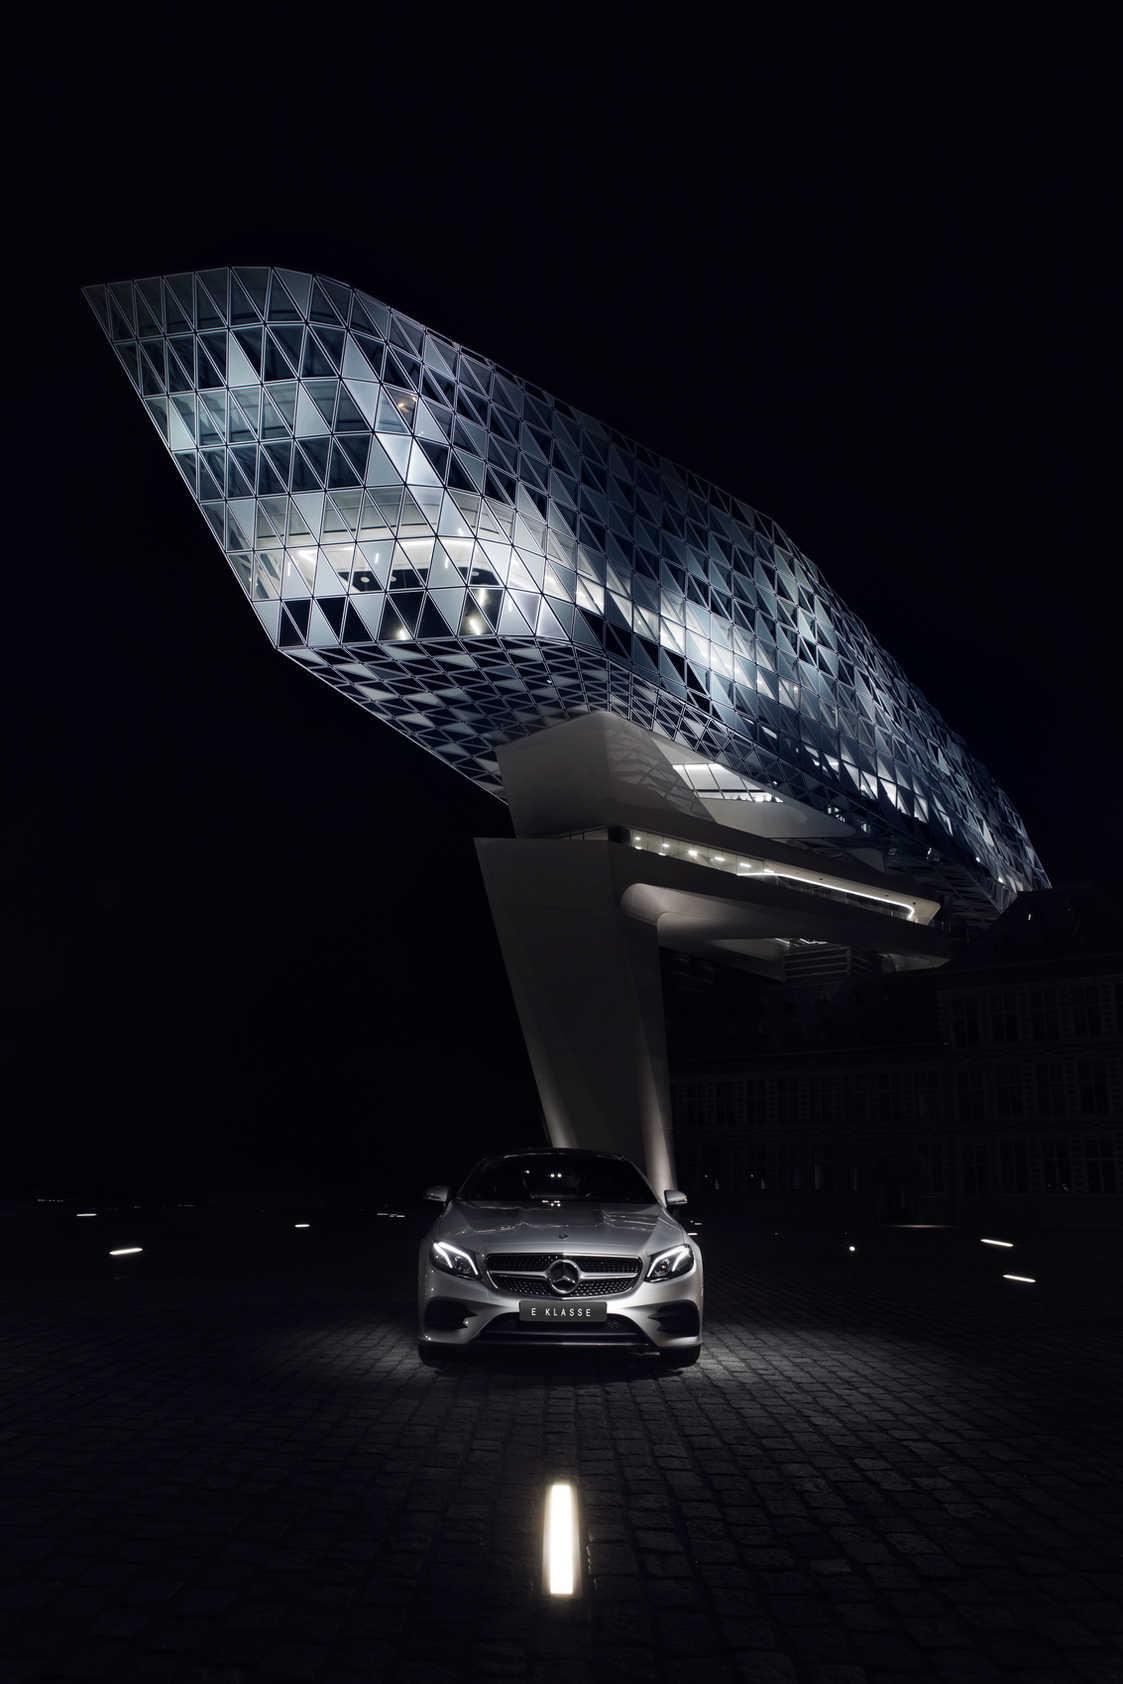 autofotografie-automotivefotografie-sebastien Adriaensen - E klasse antwerpen havenhuis